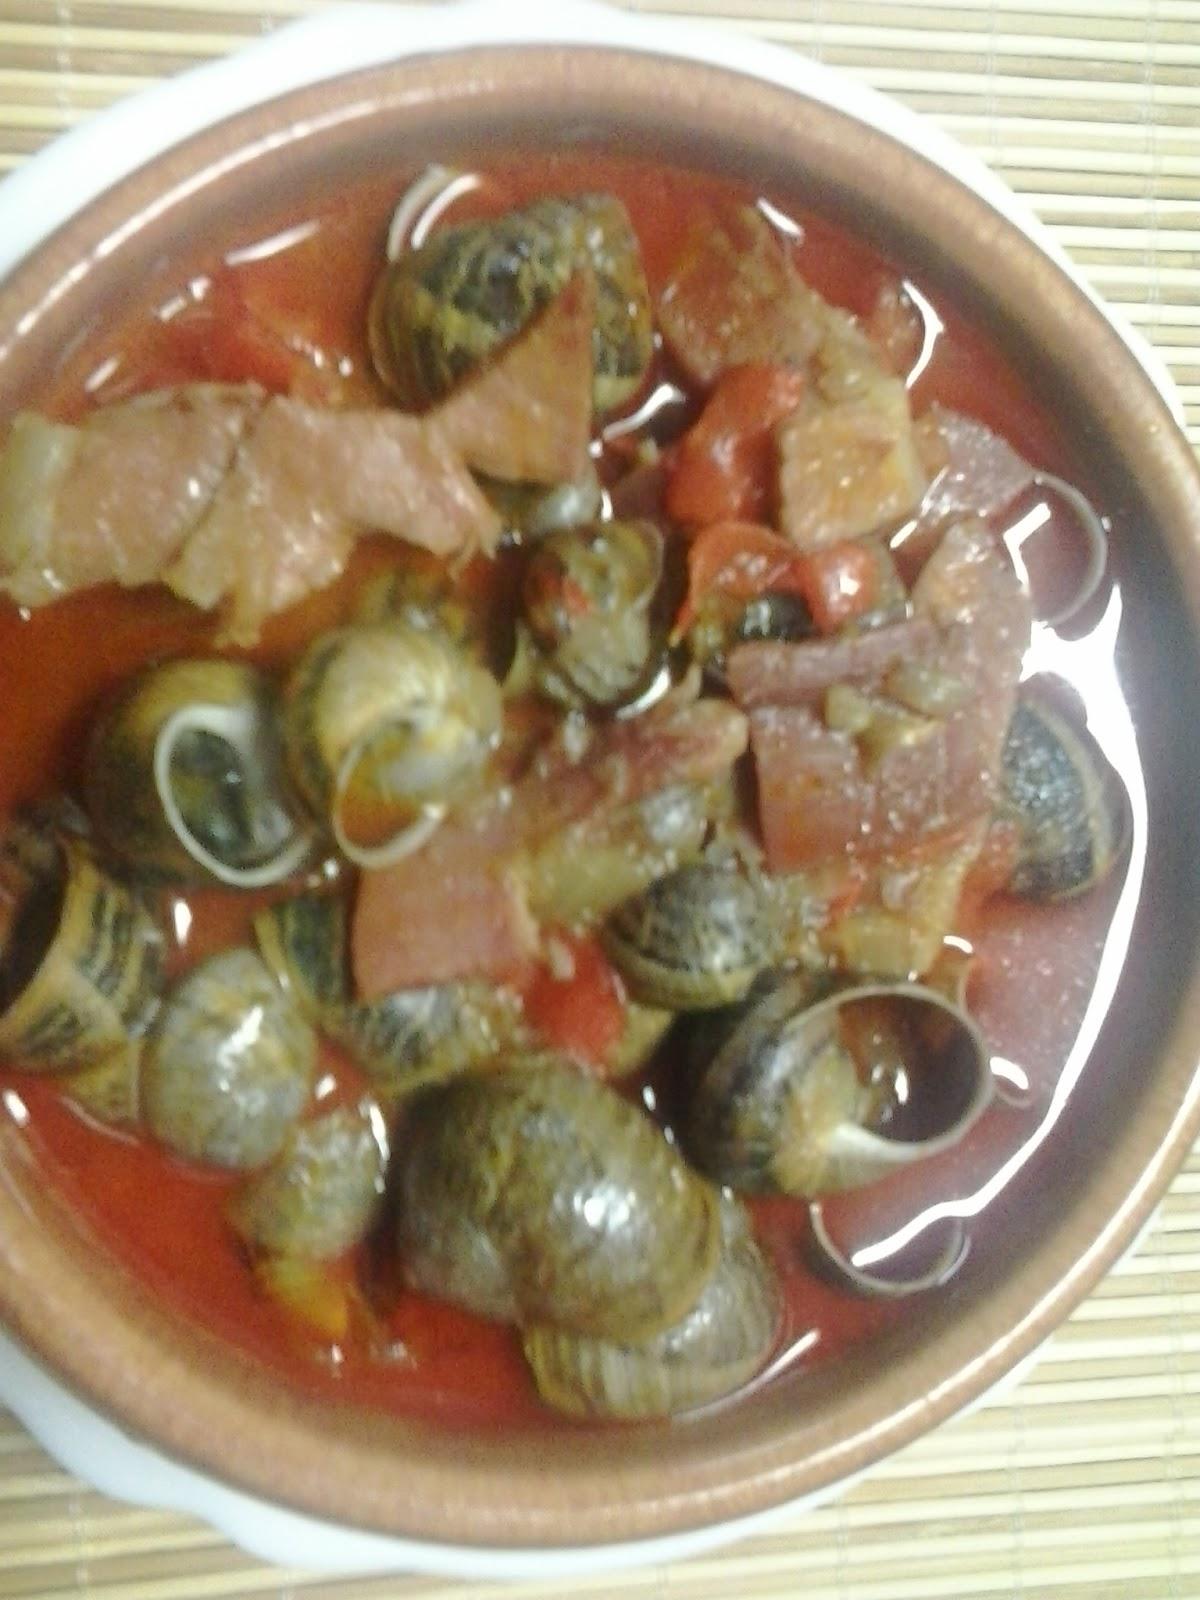 caracoles con jamon: